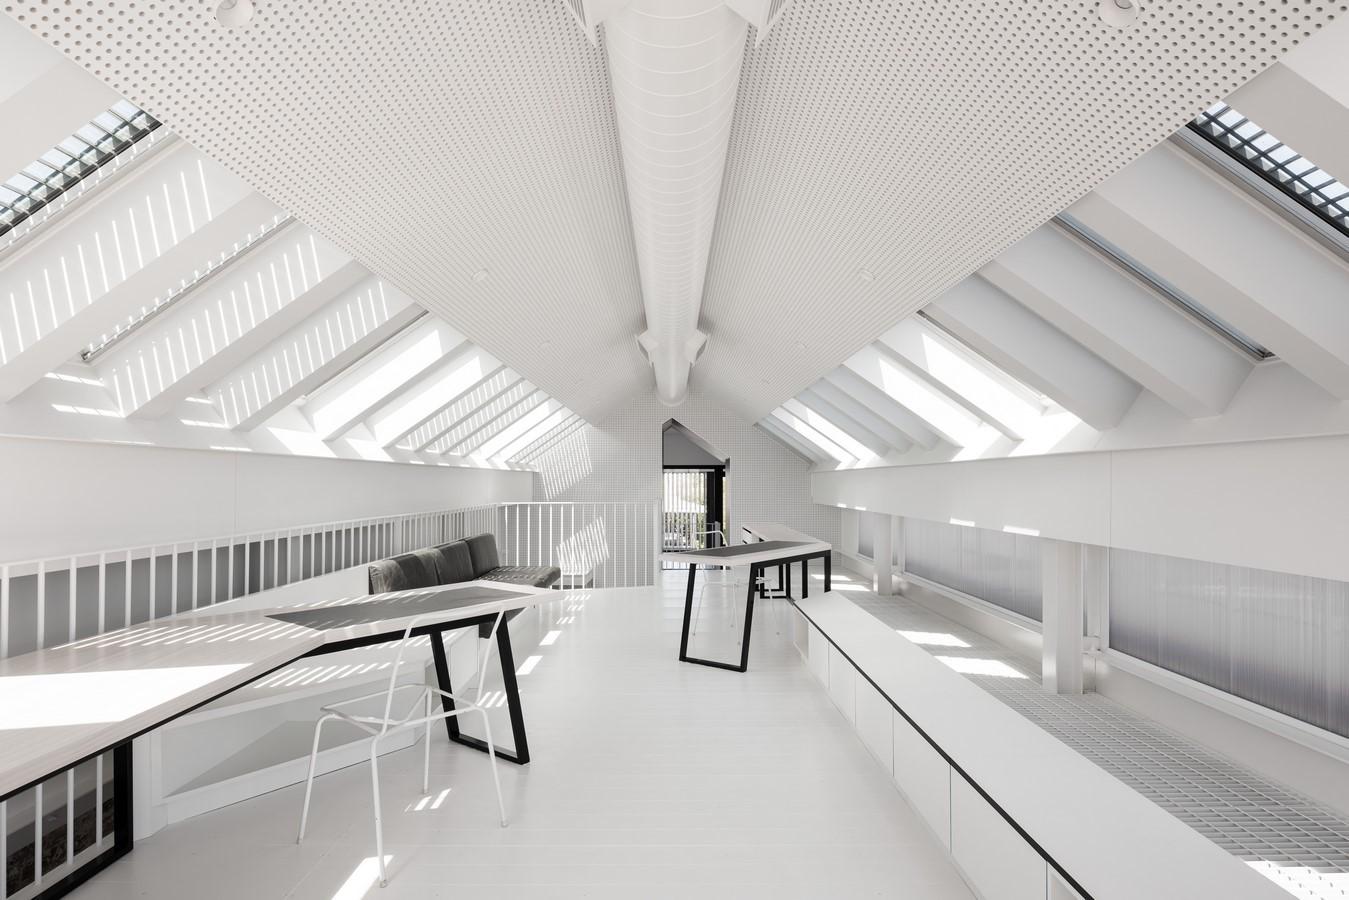 South Terrace Mezzanine House By Philip Stejskal Architecture - Sheet1